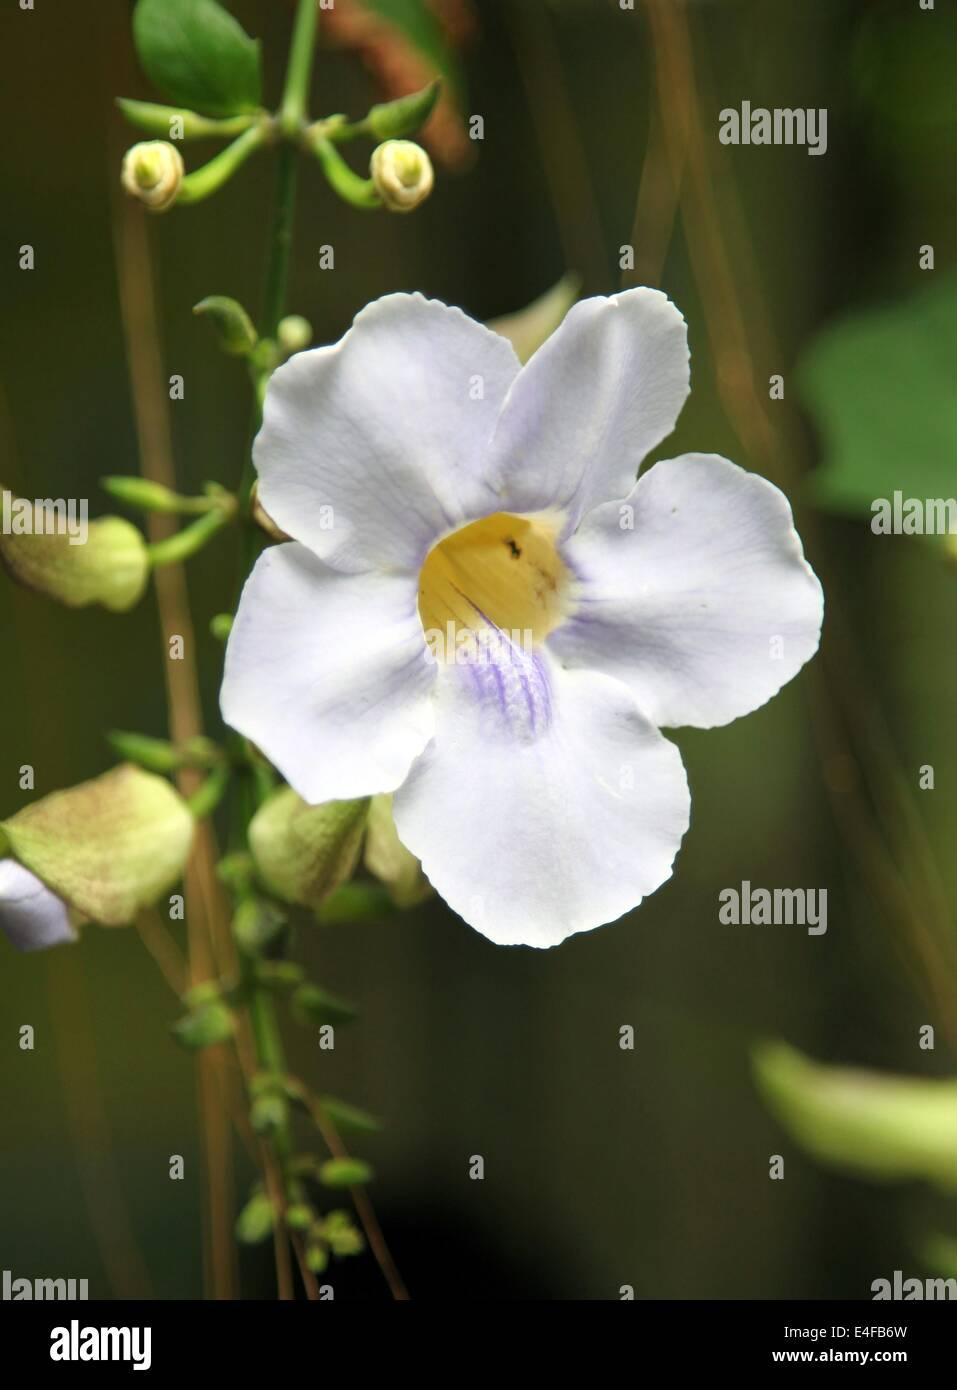 Jasmine Flower Photo Stock Photos Jasmine Flower Photo Stock